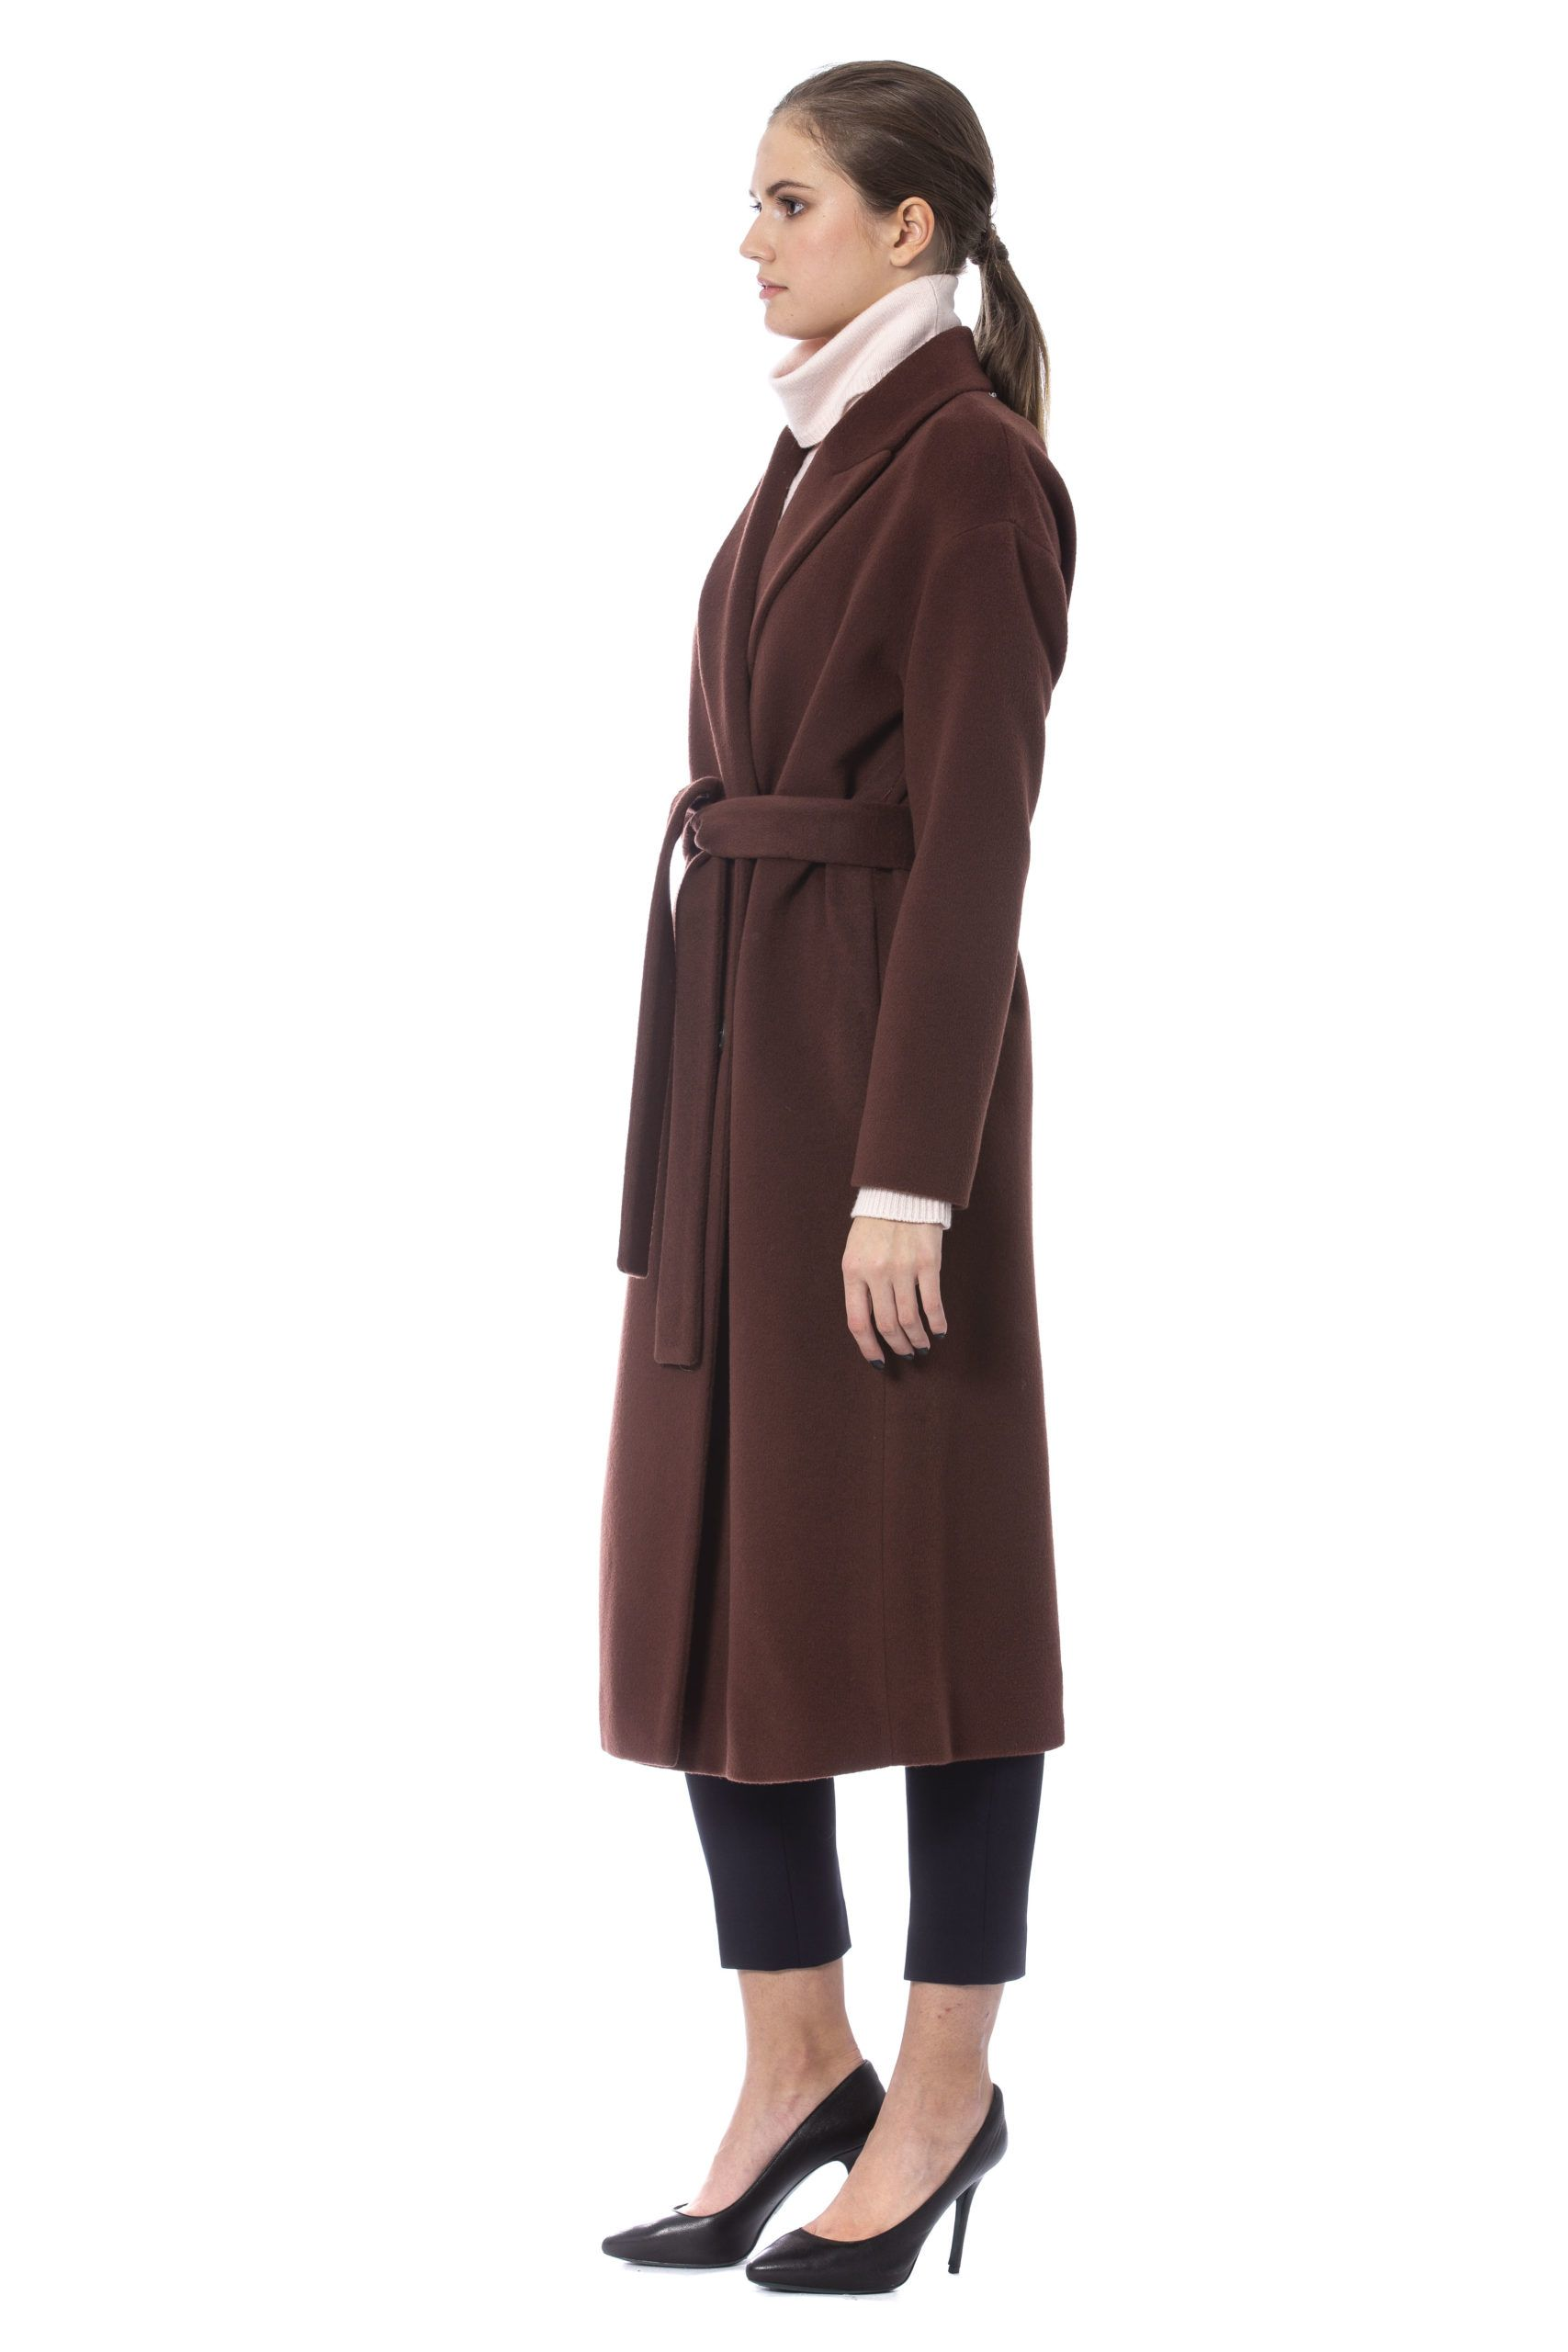 Peserico Mattone Jackets & Coat